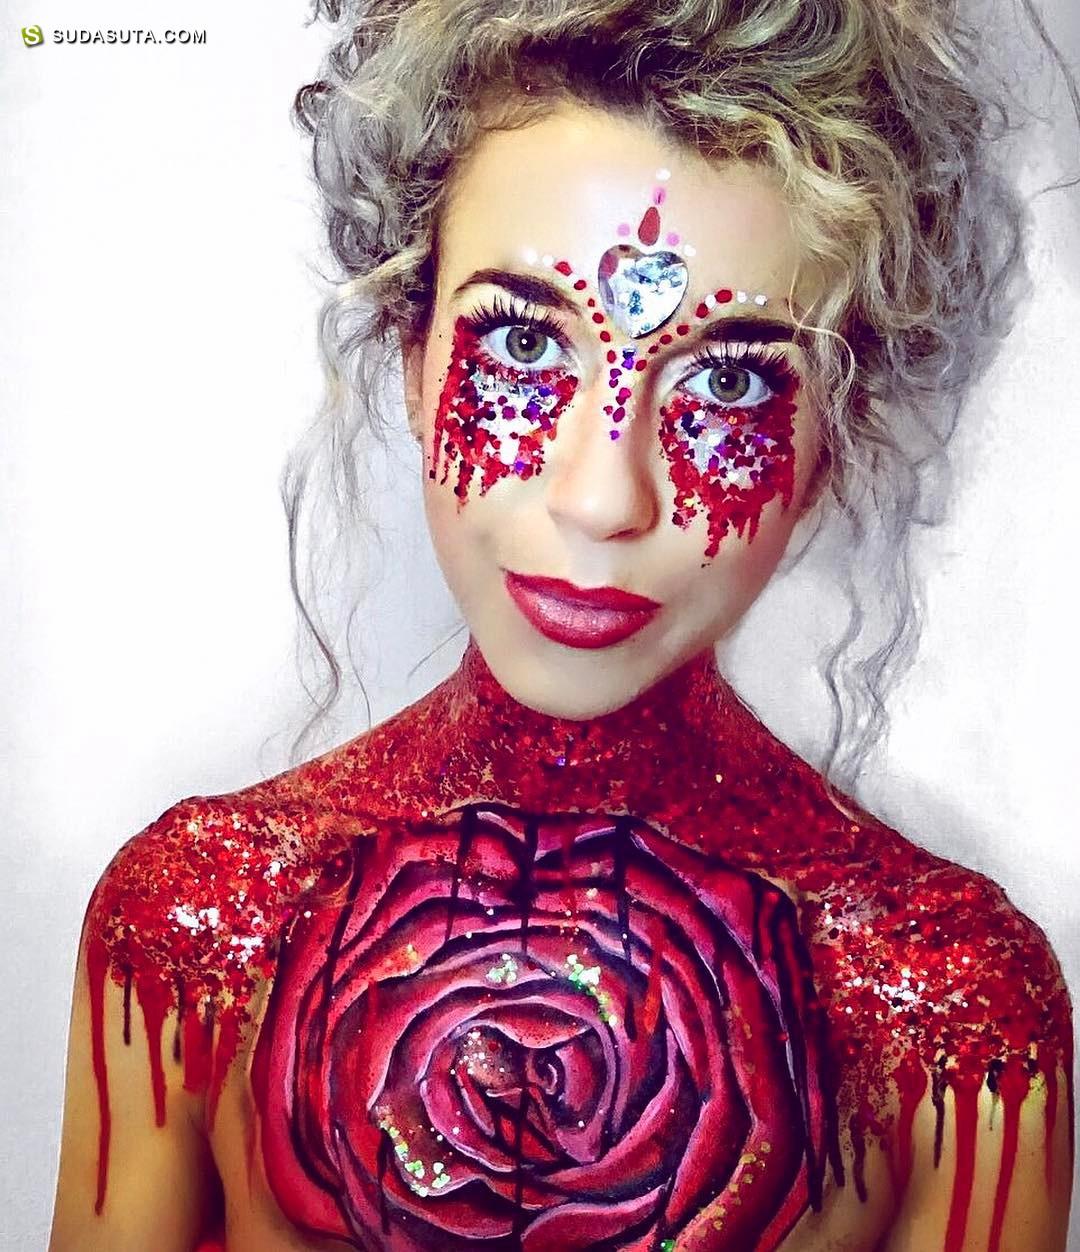 THE GYPSY SHRINE 那些闪亮着的妆面艺术